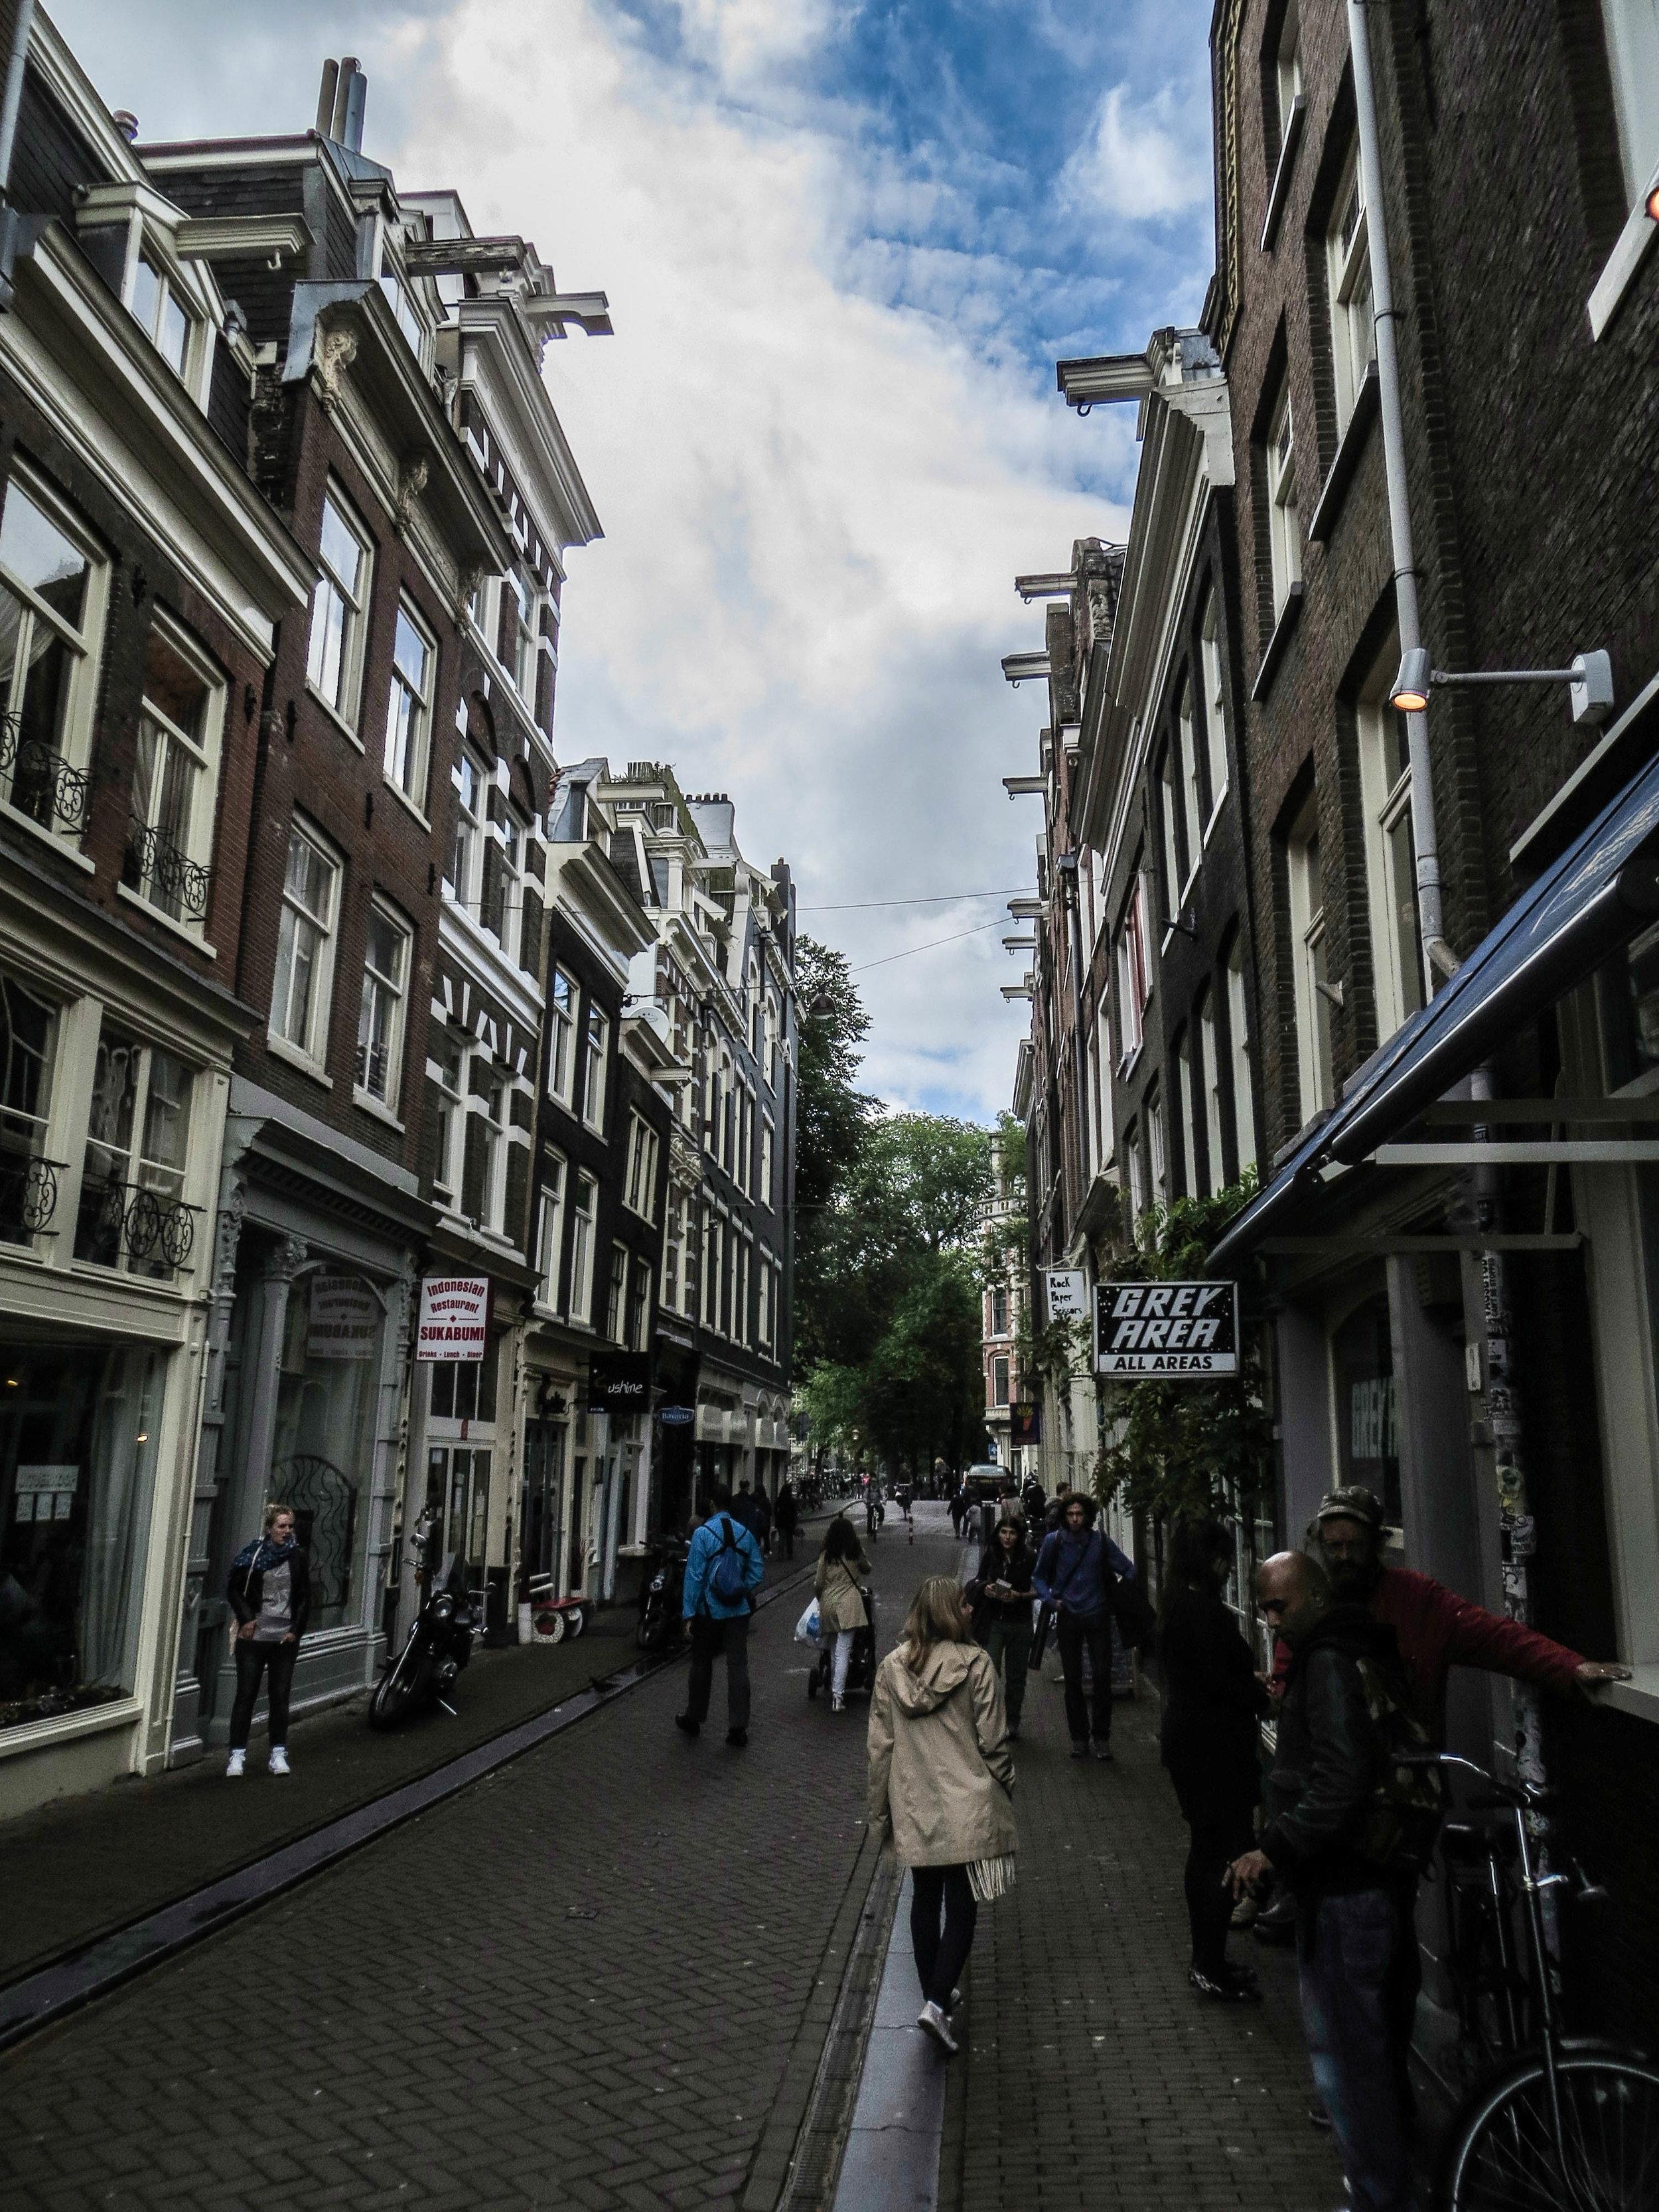 amsterdam-netherlands-street-photography-14-2.jpg